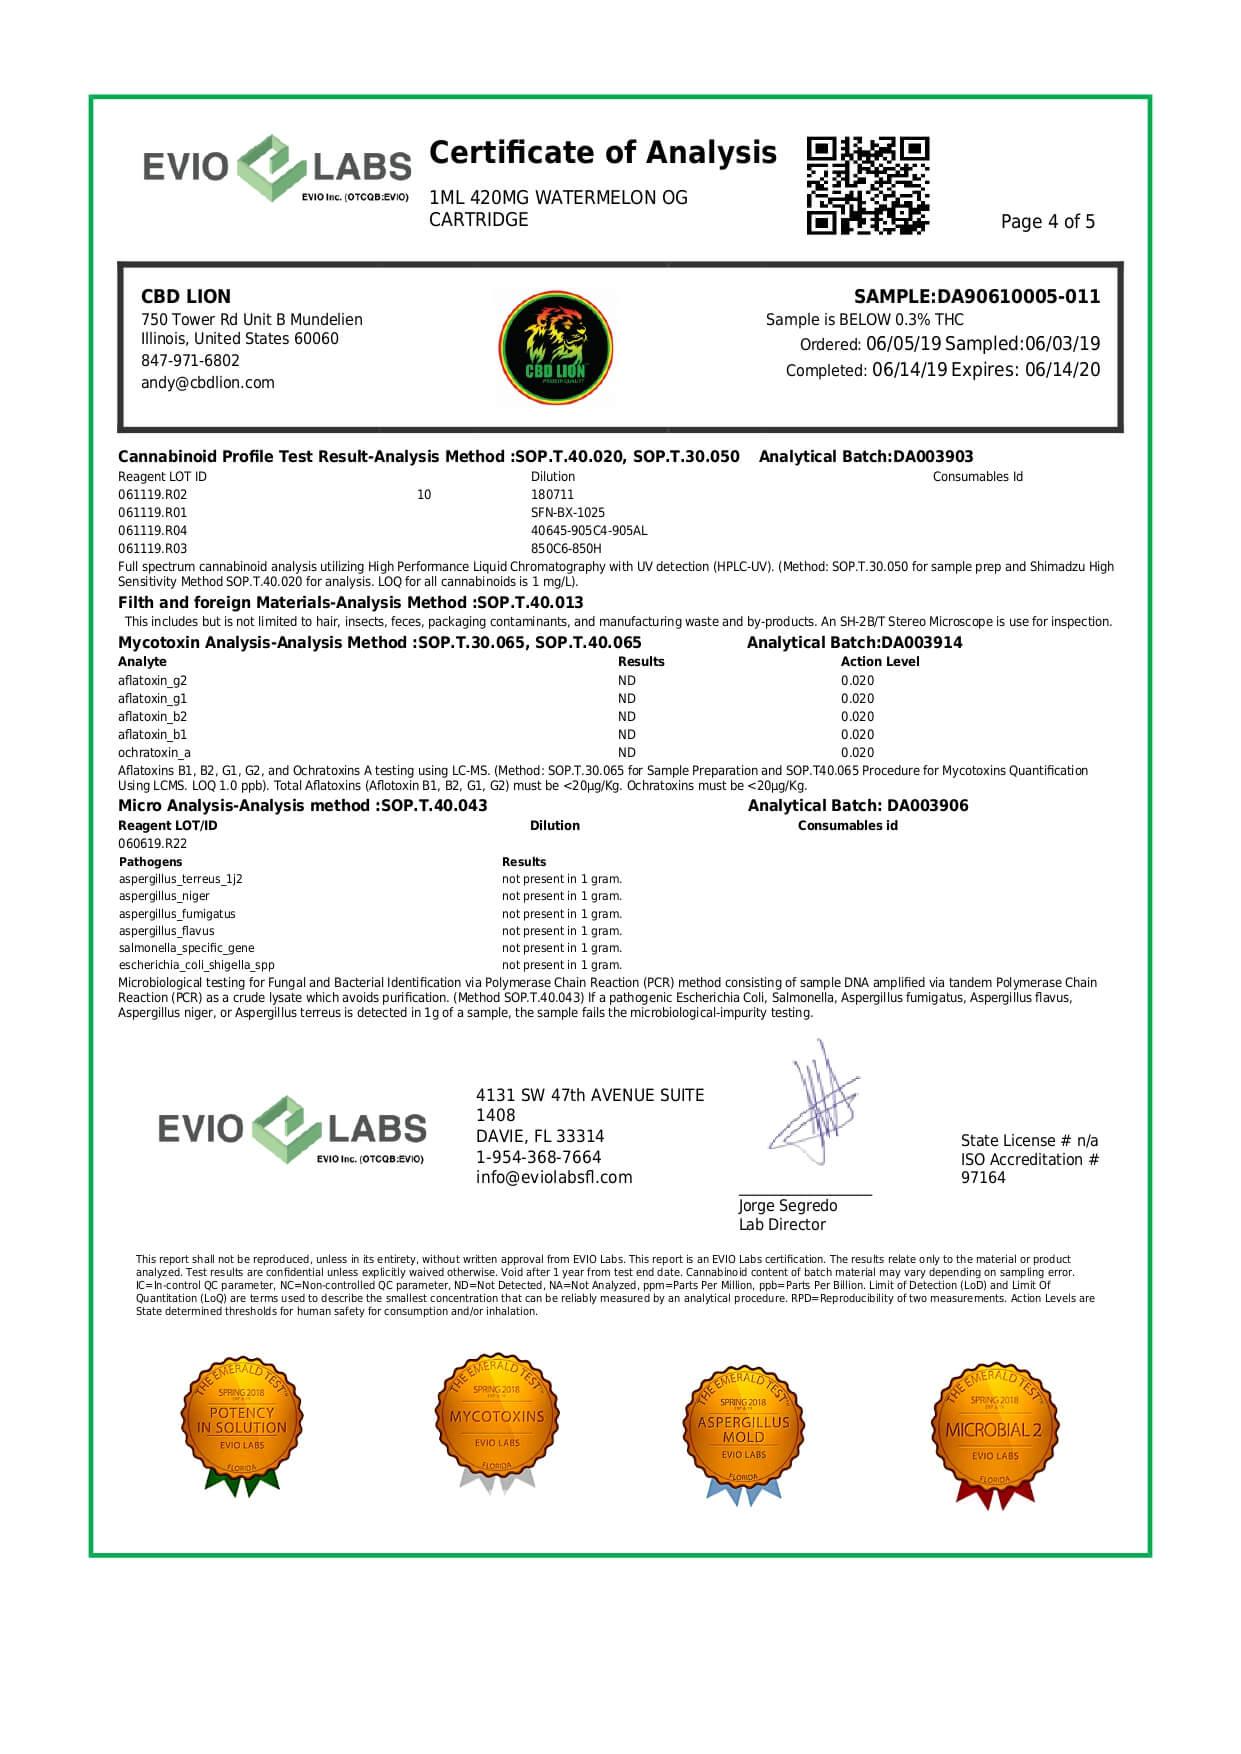 CBD Lion CBD Cartridge Watermelon OG 420mg Lab Report